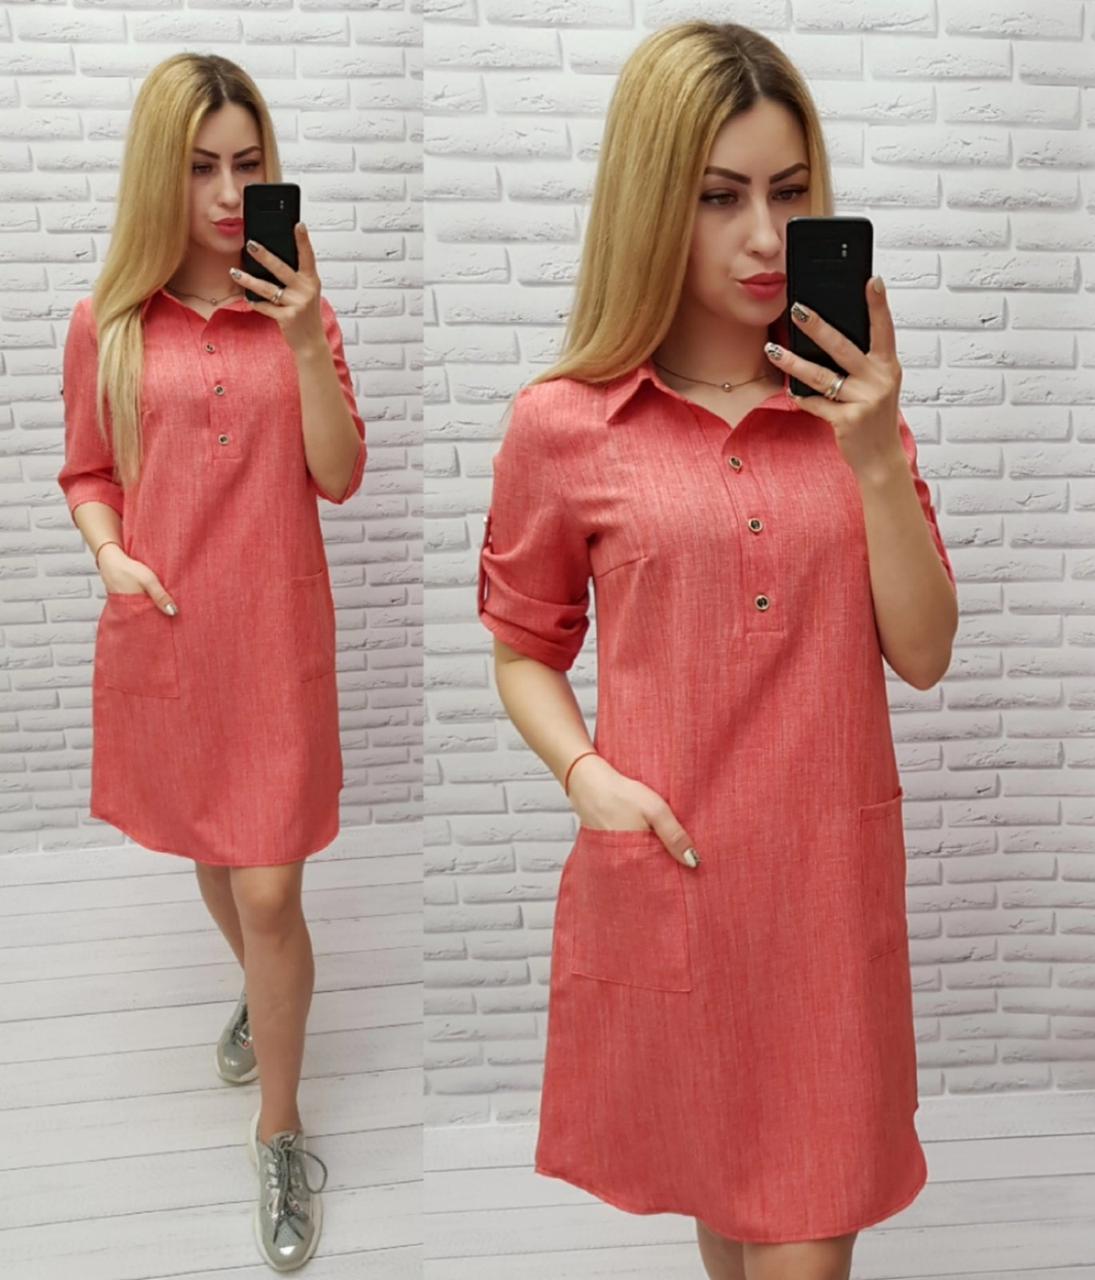 Арт831 Хлопковое платье-рубашка с карманами однотон, коралл/ алого/ кораллового цвета